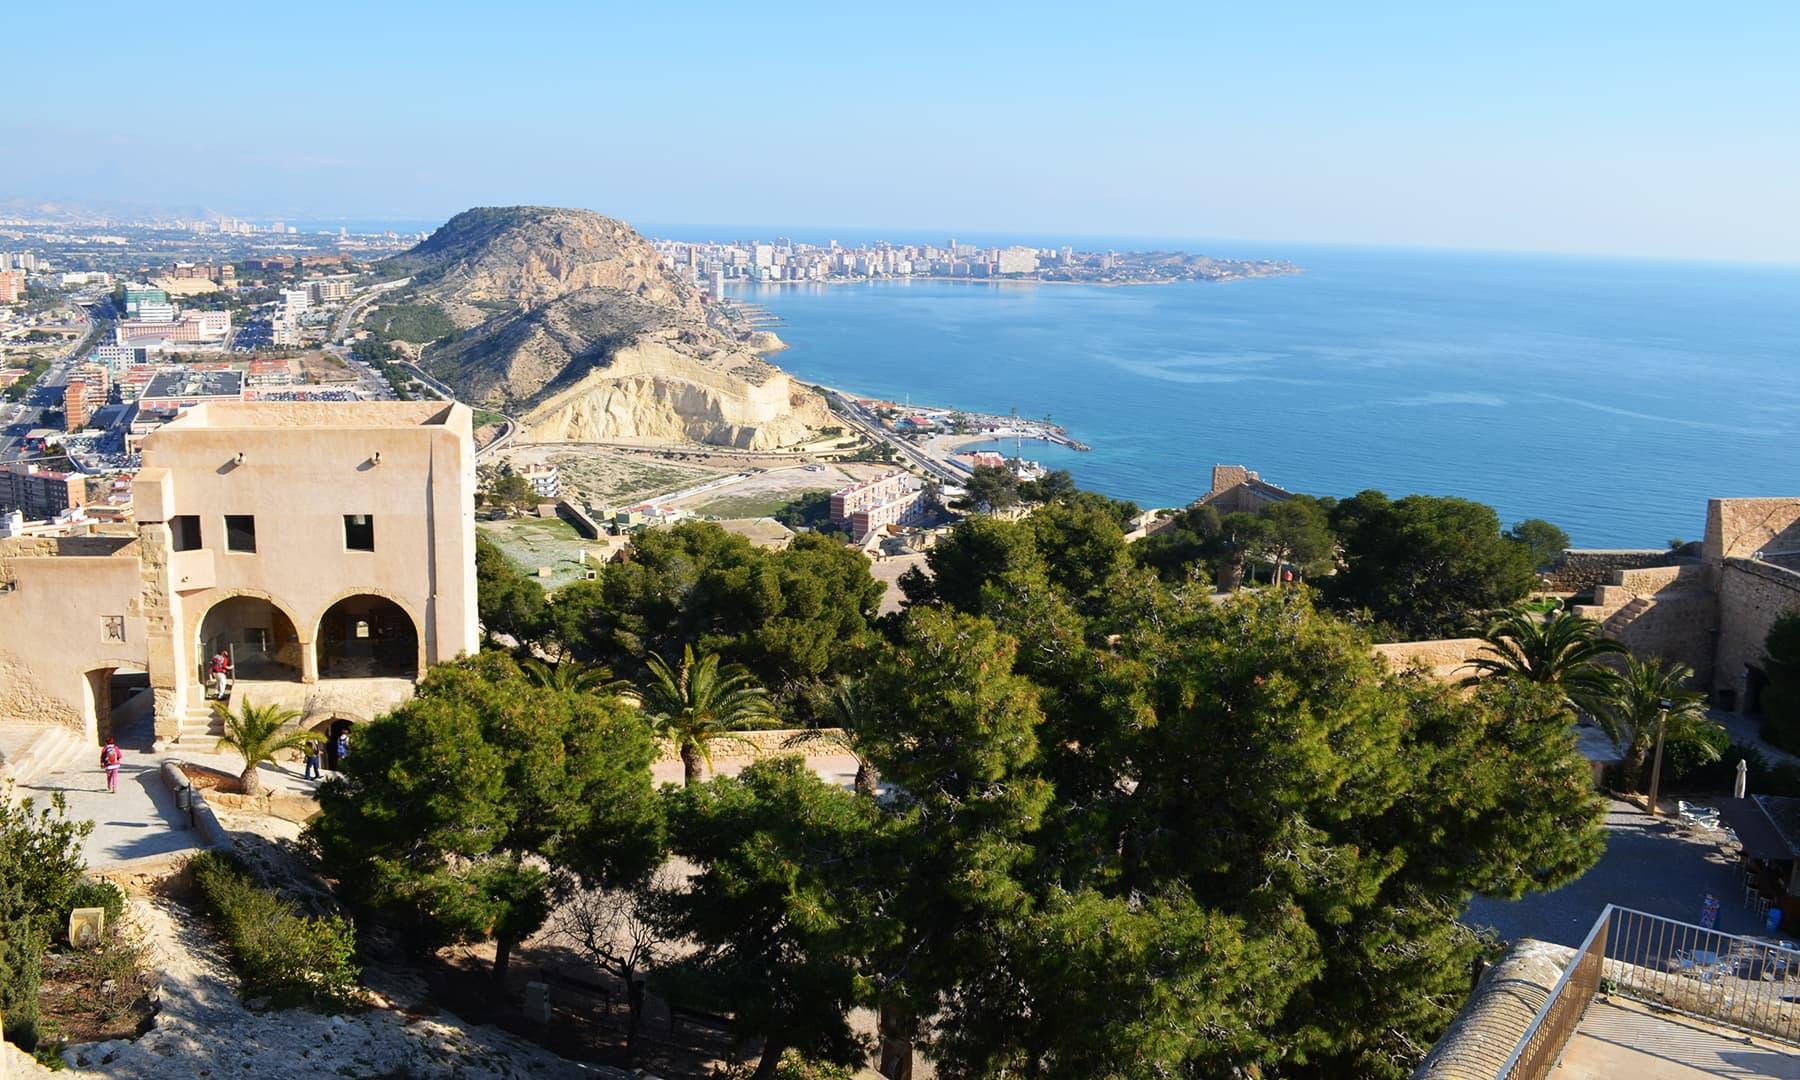 اسپین: مسلم سلطنت کی جیتی جاگتی یادگار